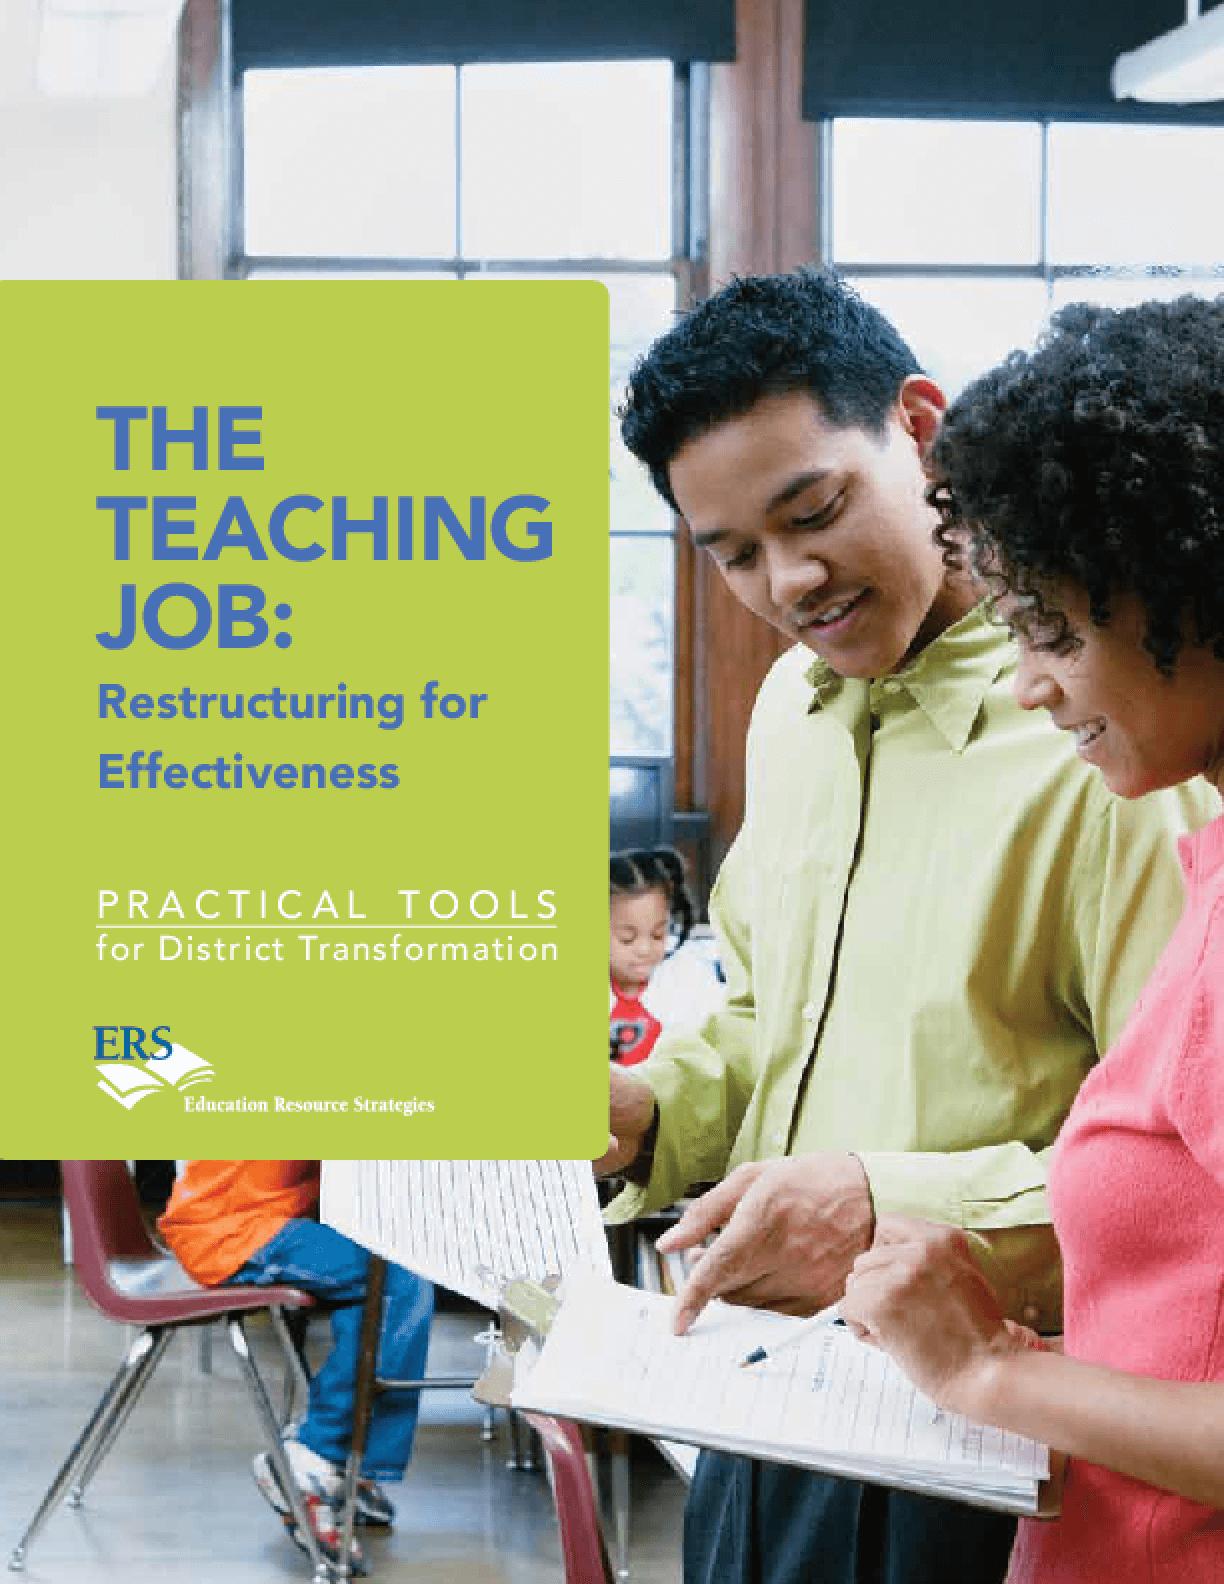 The Teaching Job